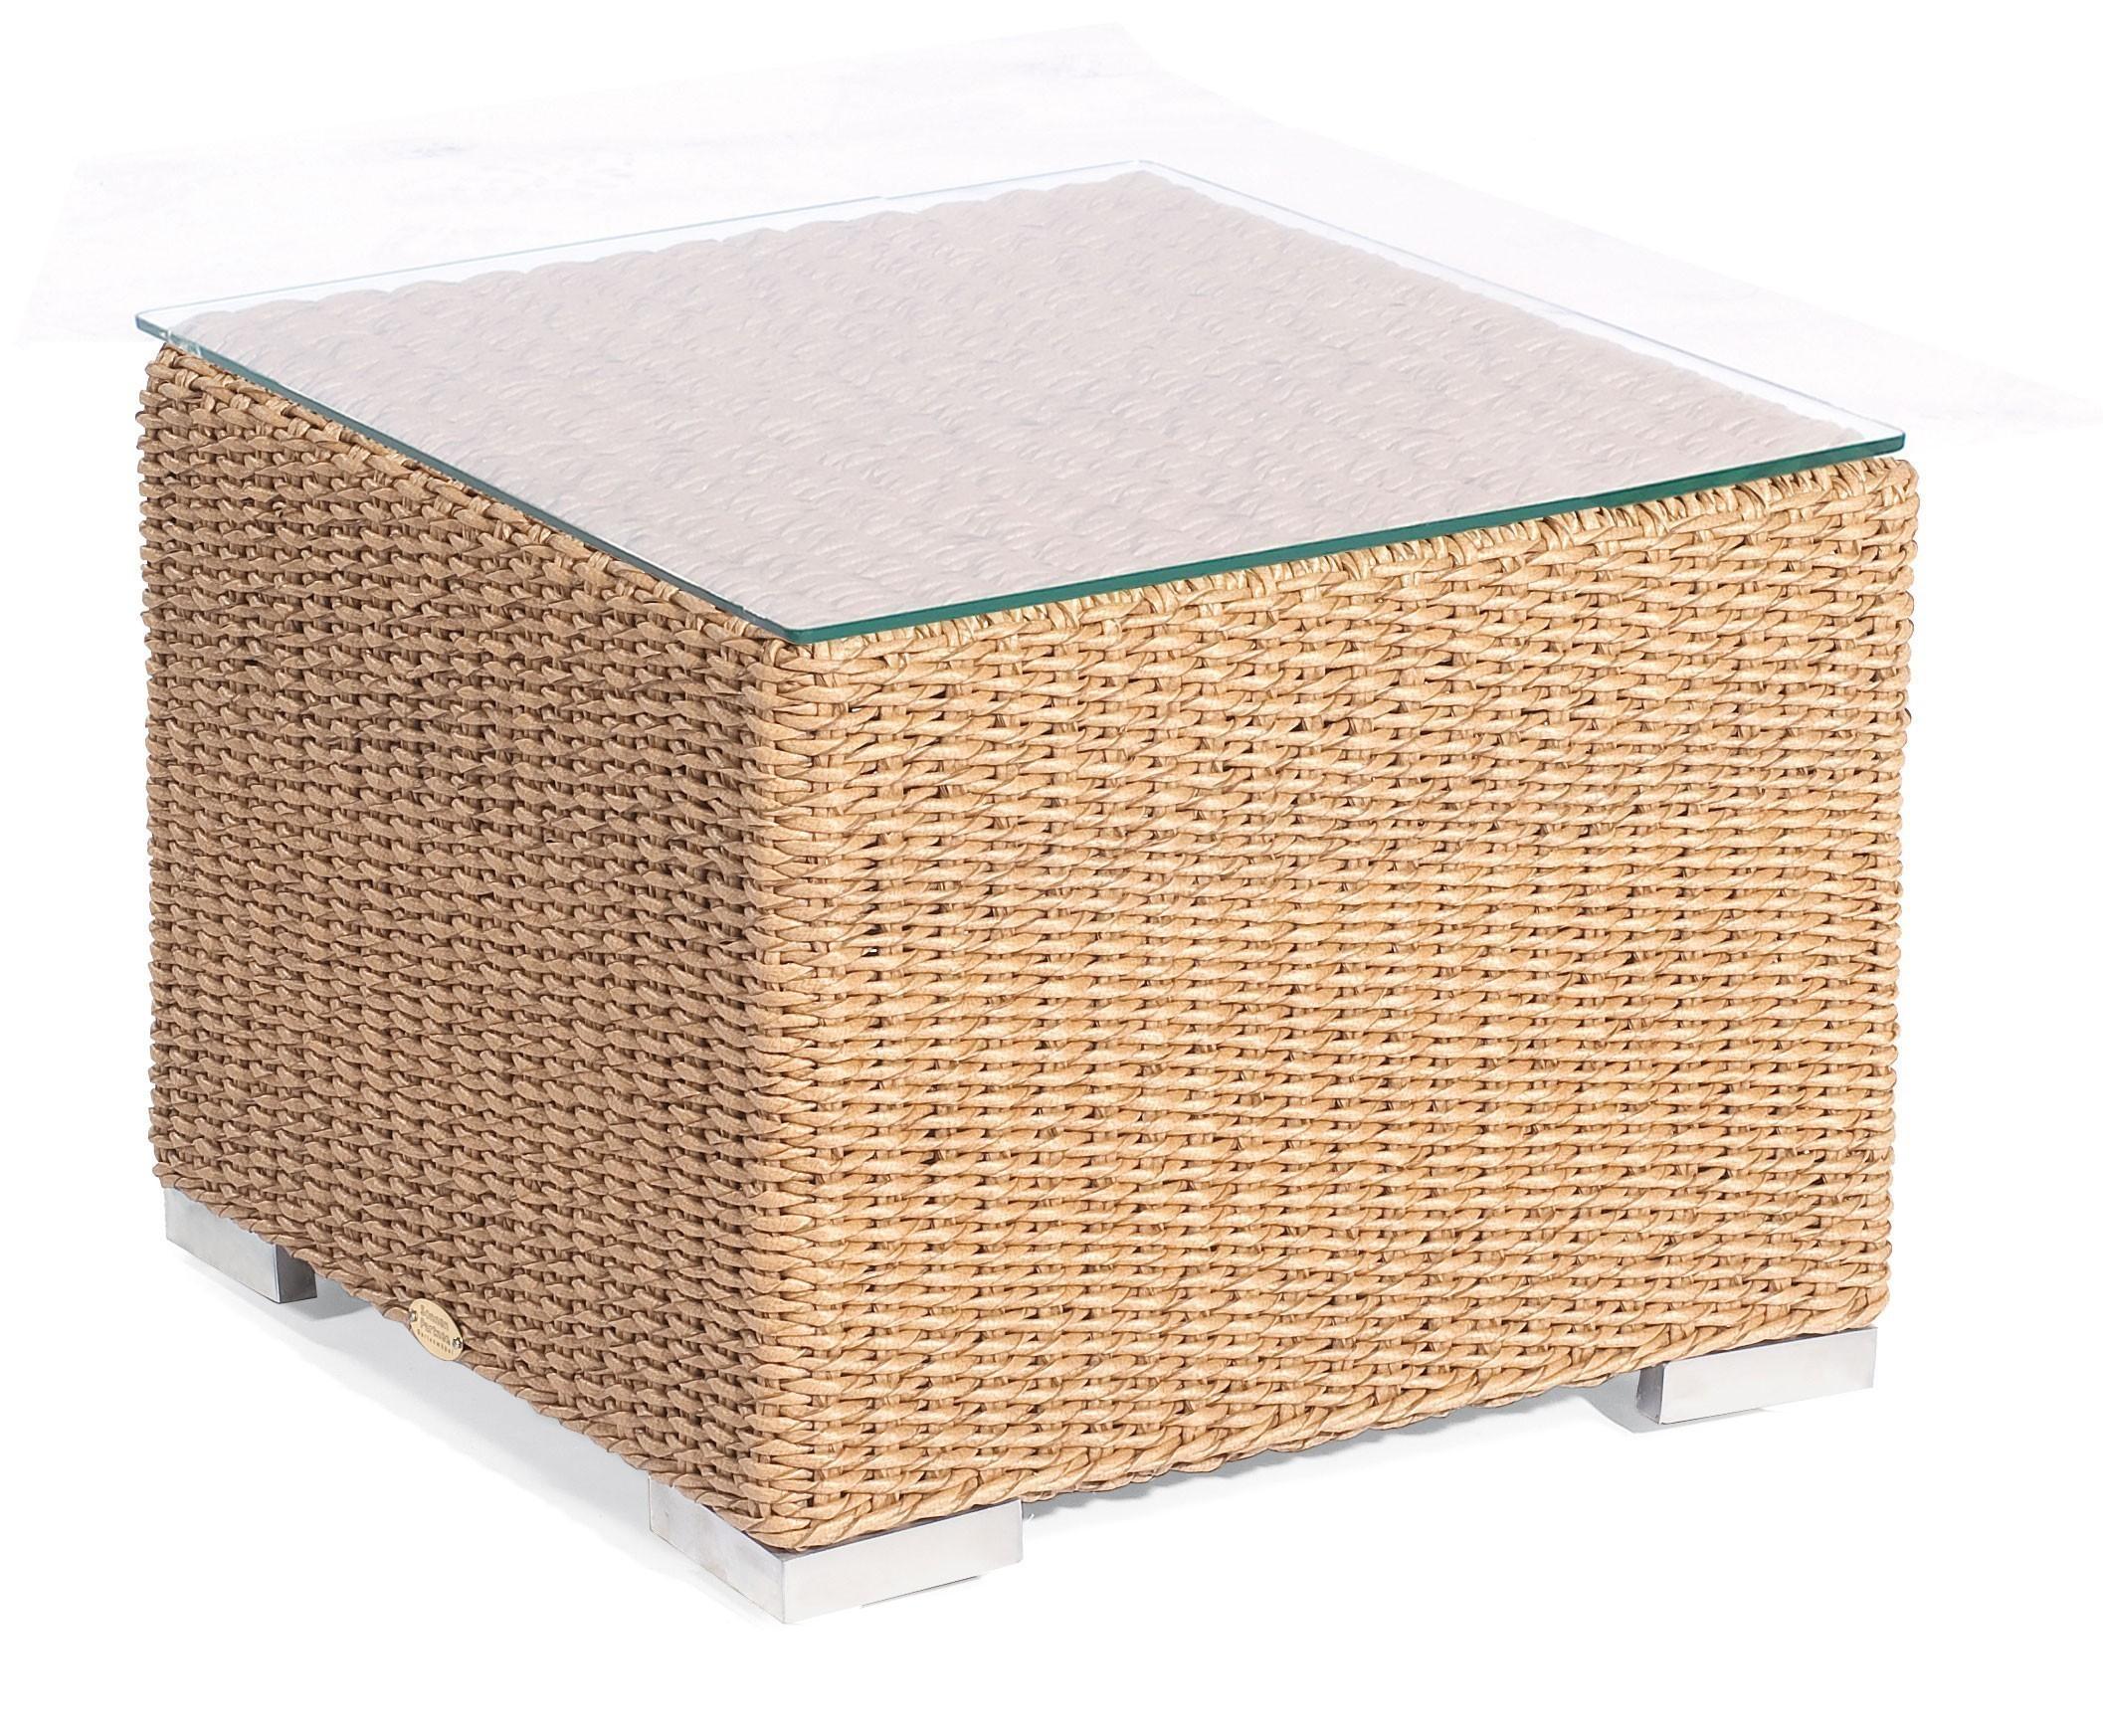 gartentisch korbm bel wetterfest residence 60x60cm. Black Bedroom Furniture Sets. Home Design Ideas